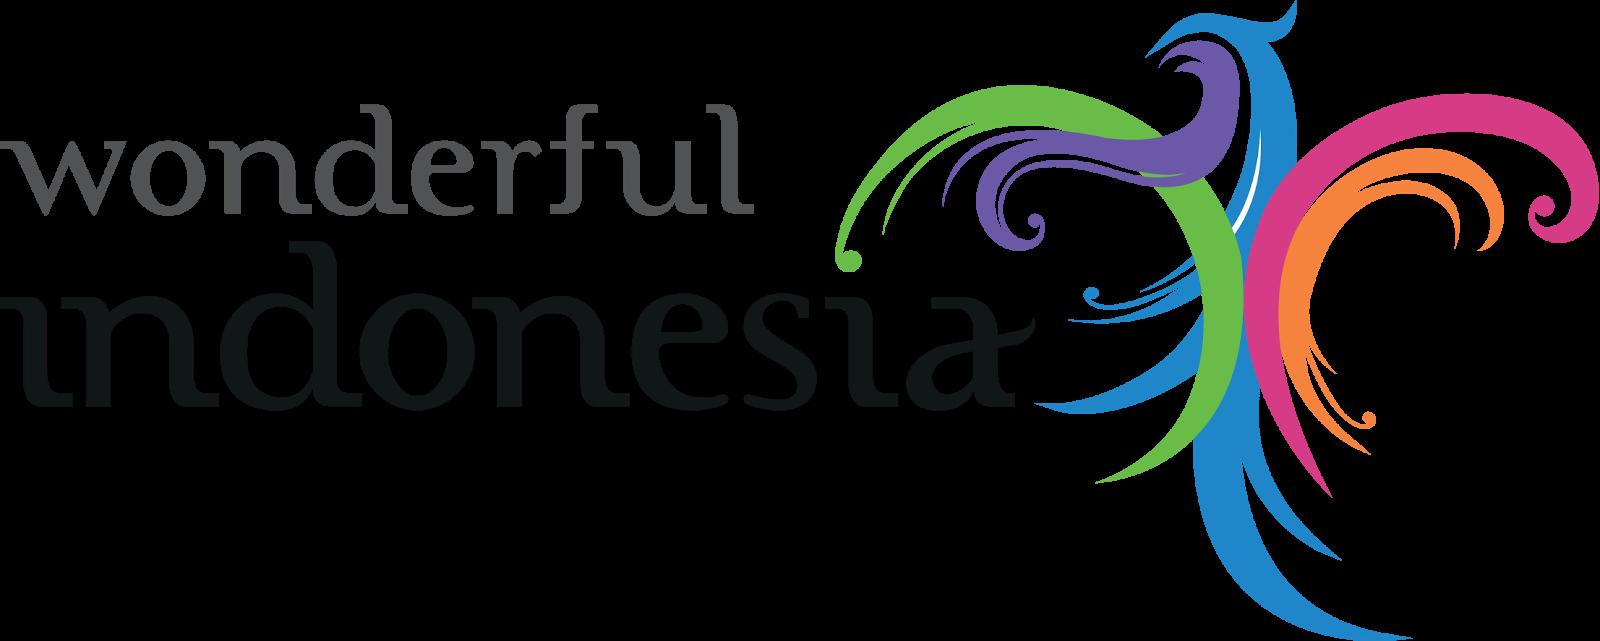 Daftar 8 Dinas Pariwisata Provinsi se-Indonesia, Beserta Alamat